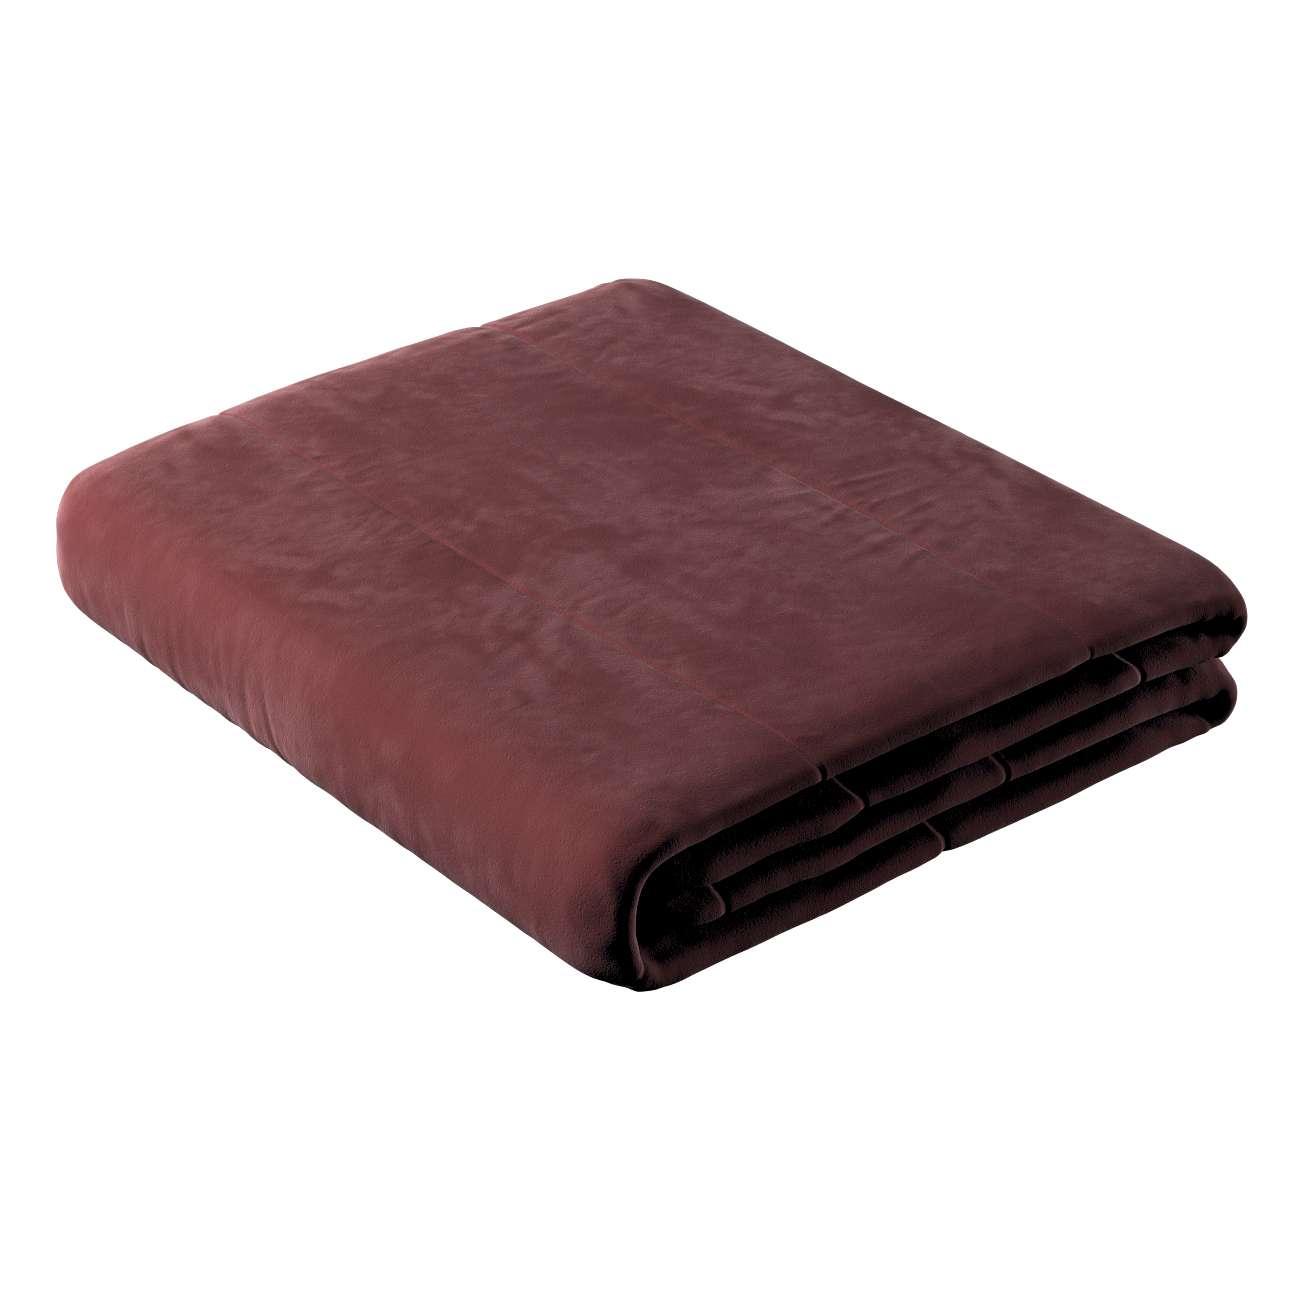 Narzuta pikowana w pasy Velvet 260 x 240 cm w kolekcji Velvet, tkanina: 704-26